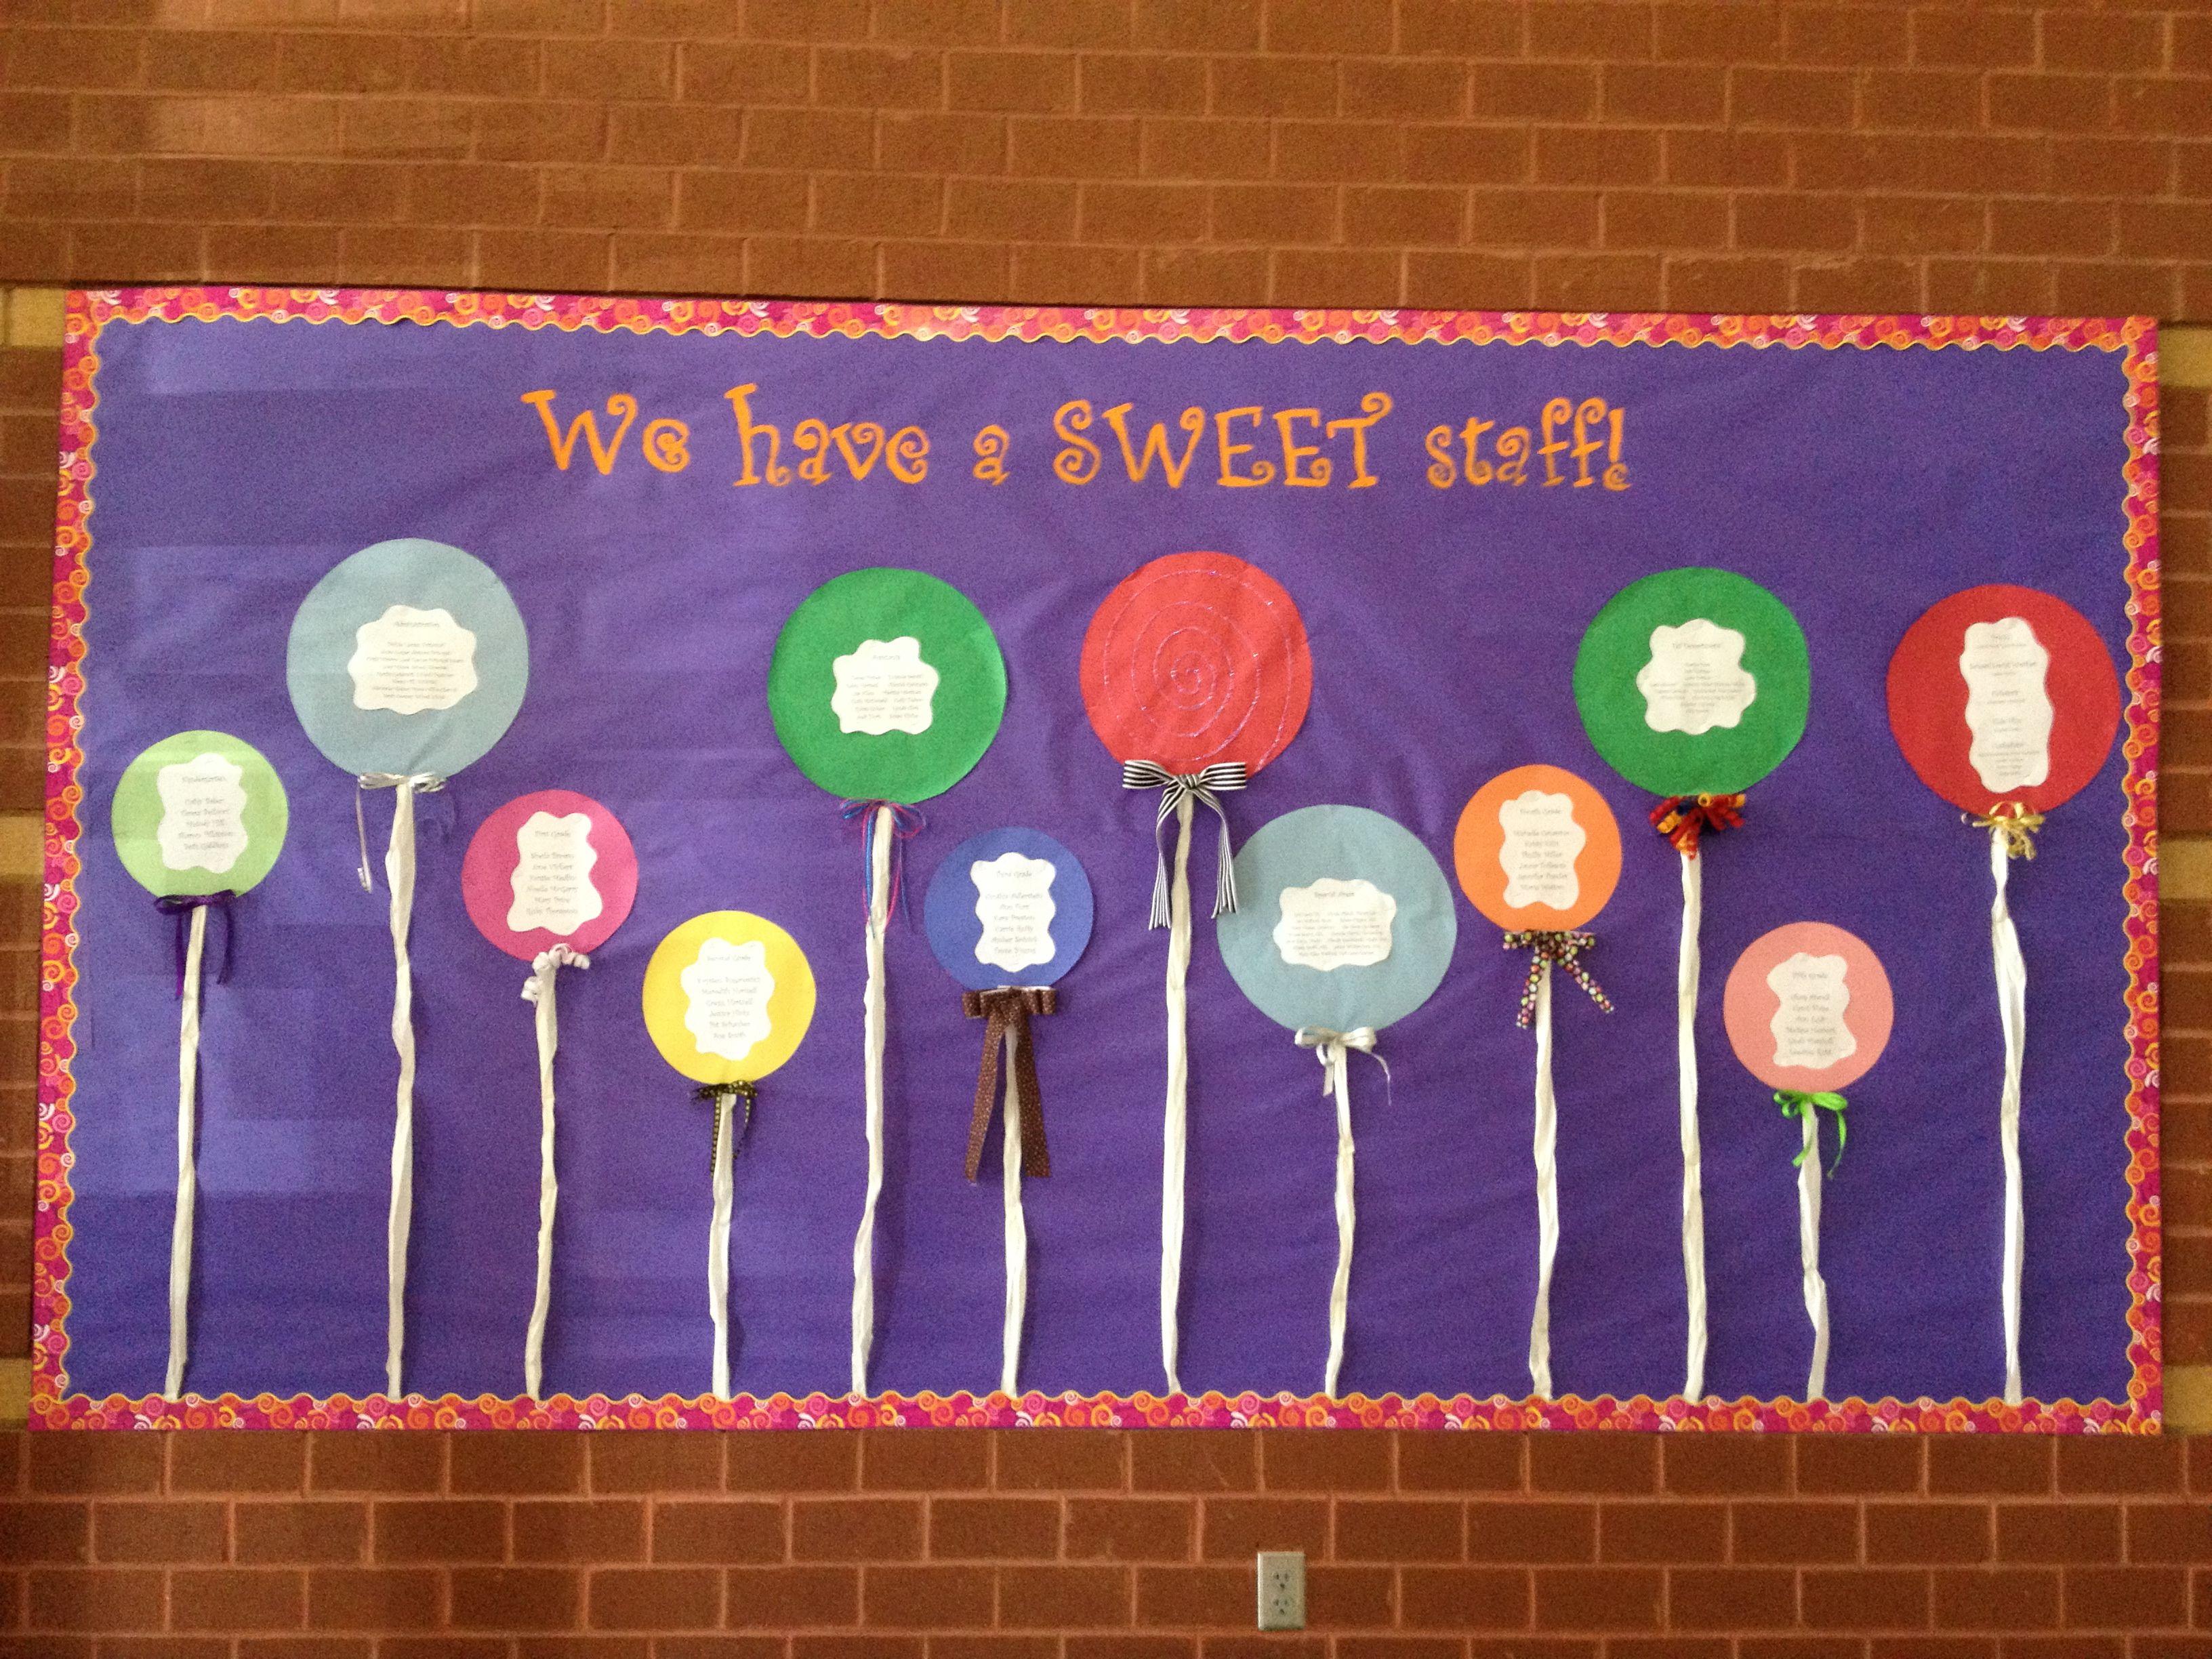 Staff Introduction Board School Decorations Staff Bulletin Boards School Bulletin Boards